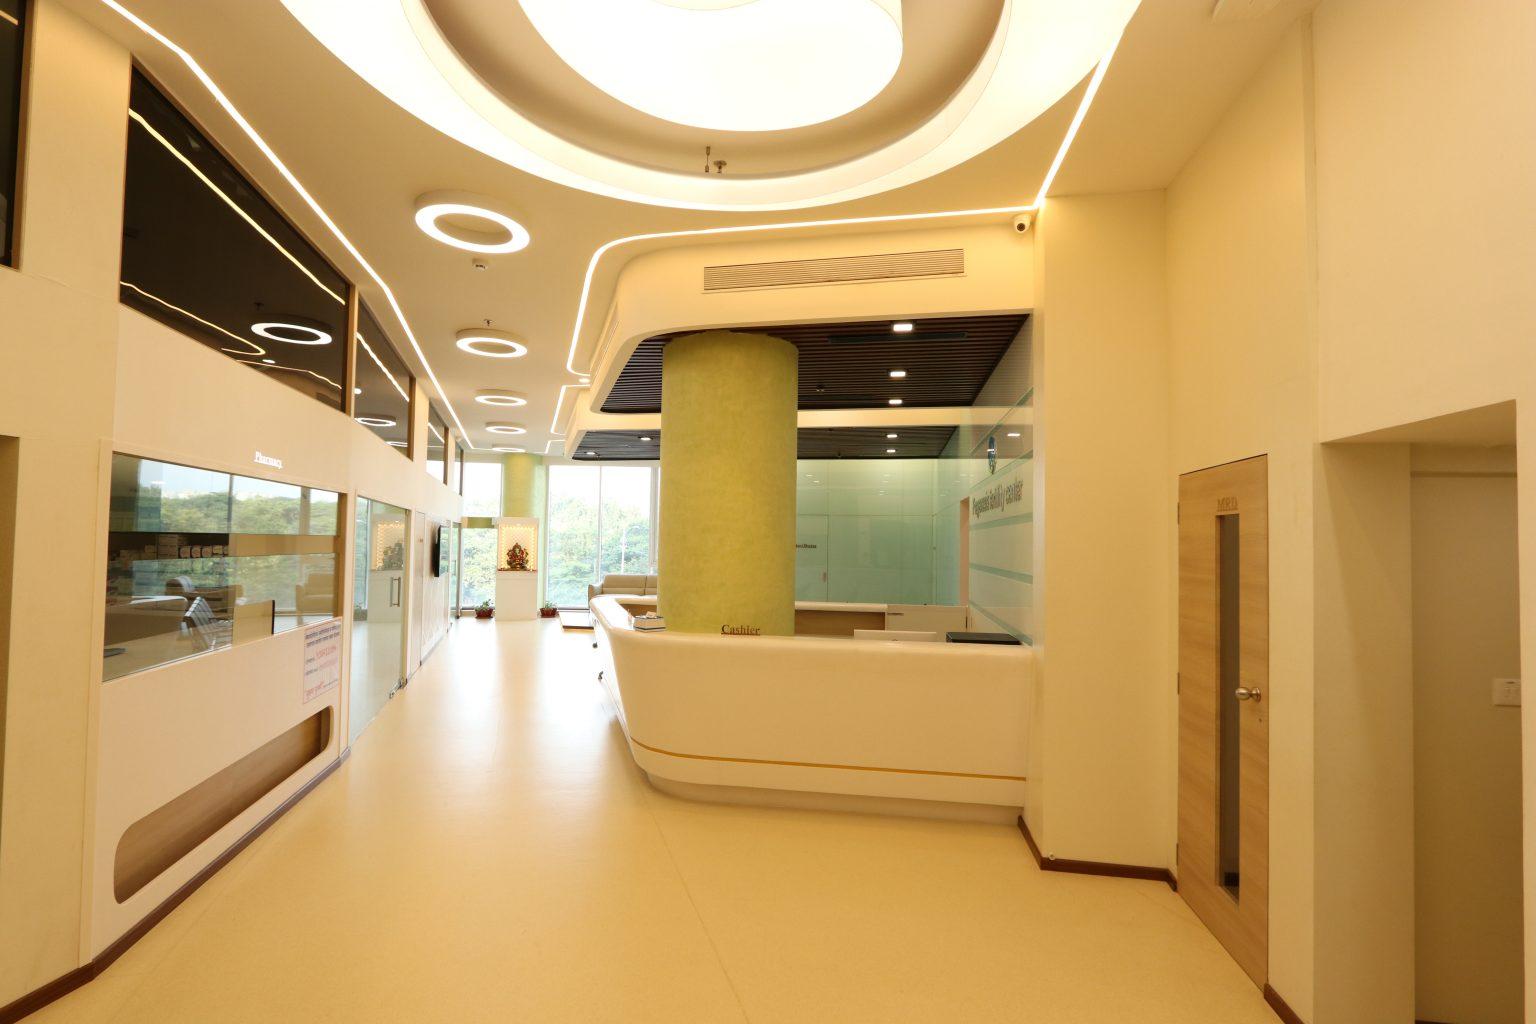 Test tube baby center in Mumbai